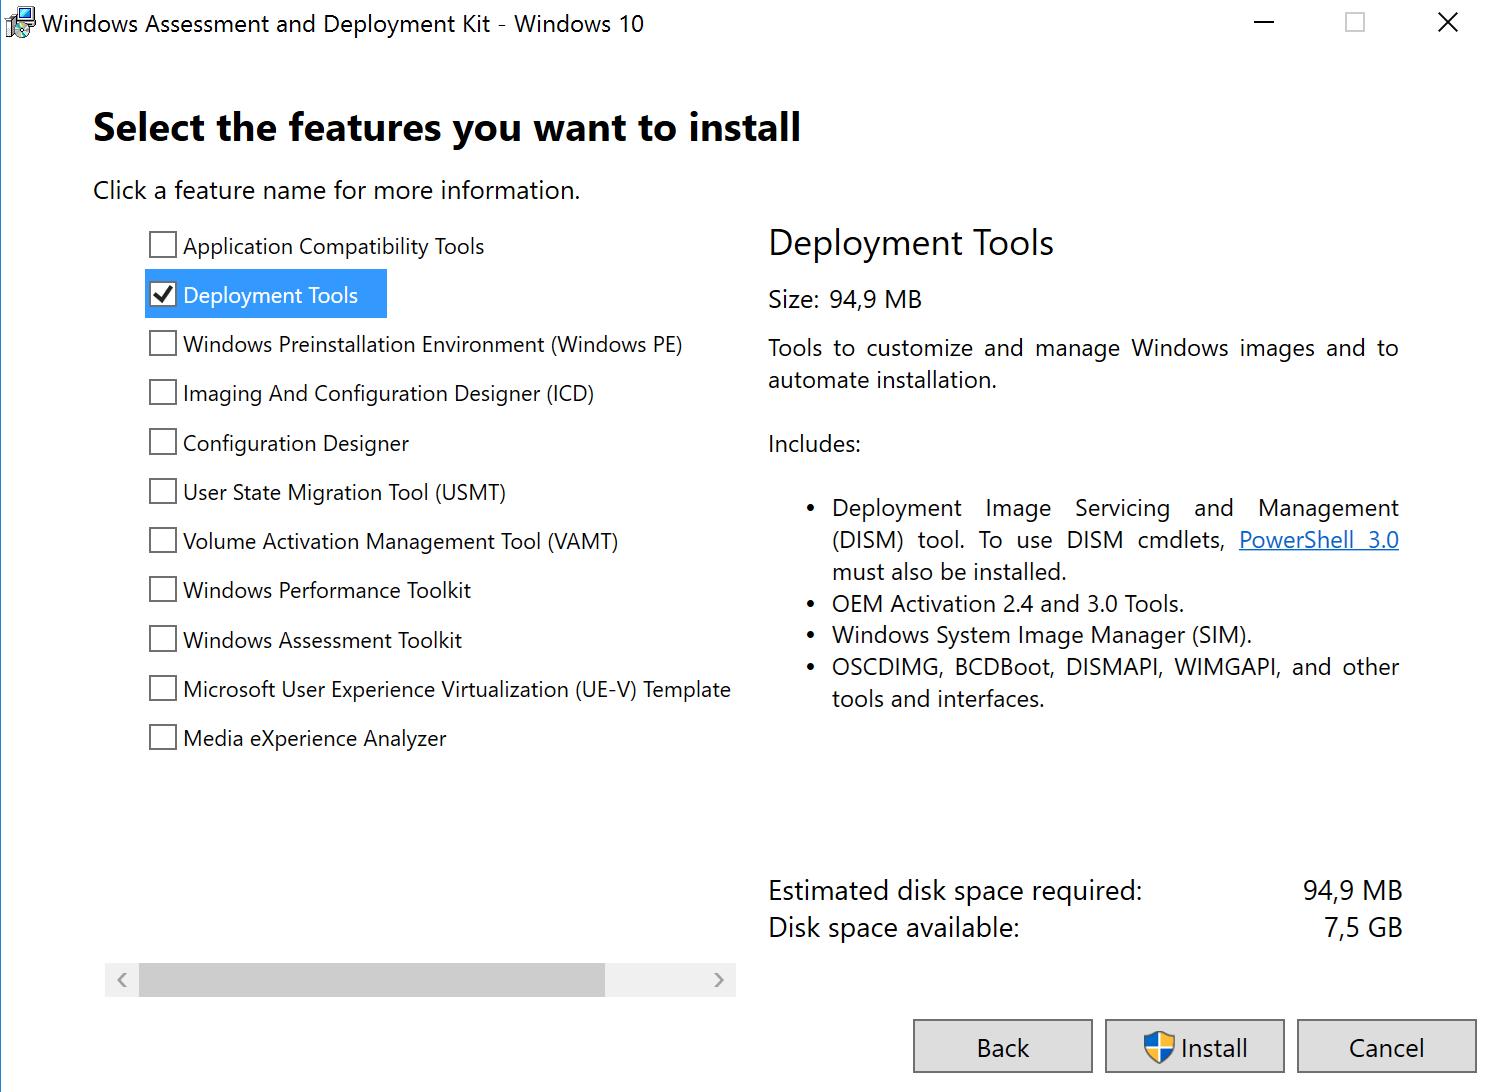 Windows Installation   ciscoucs github io